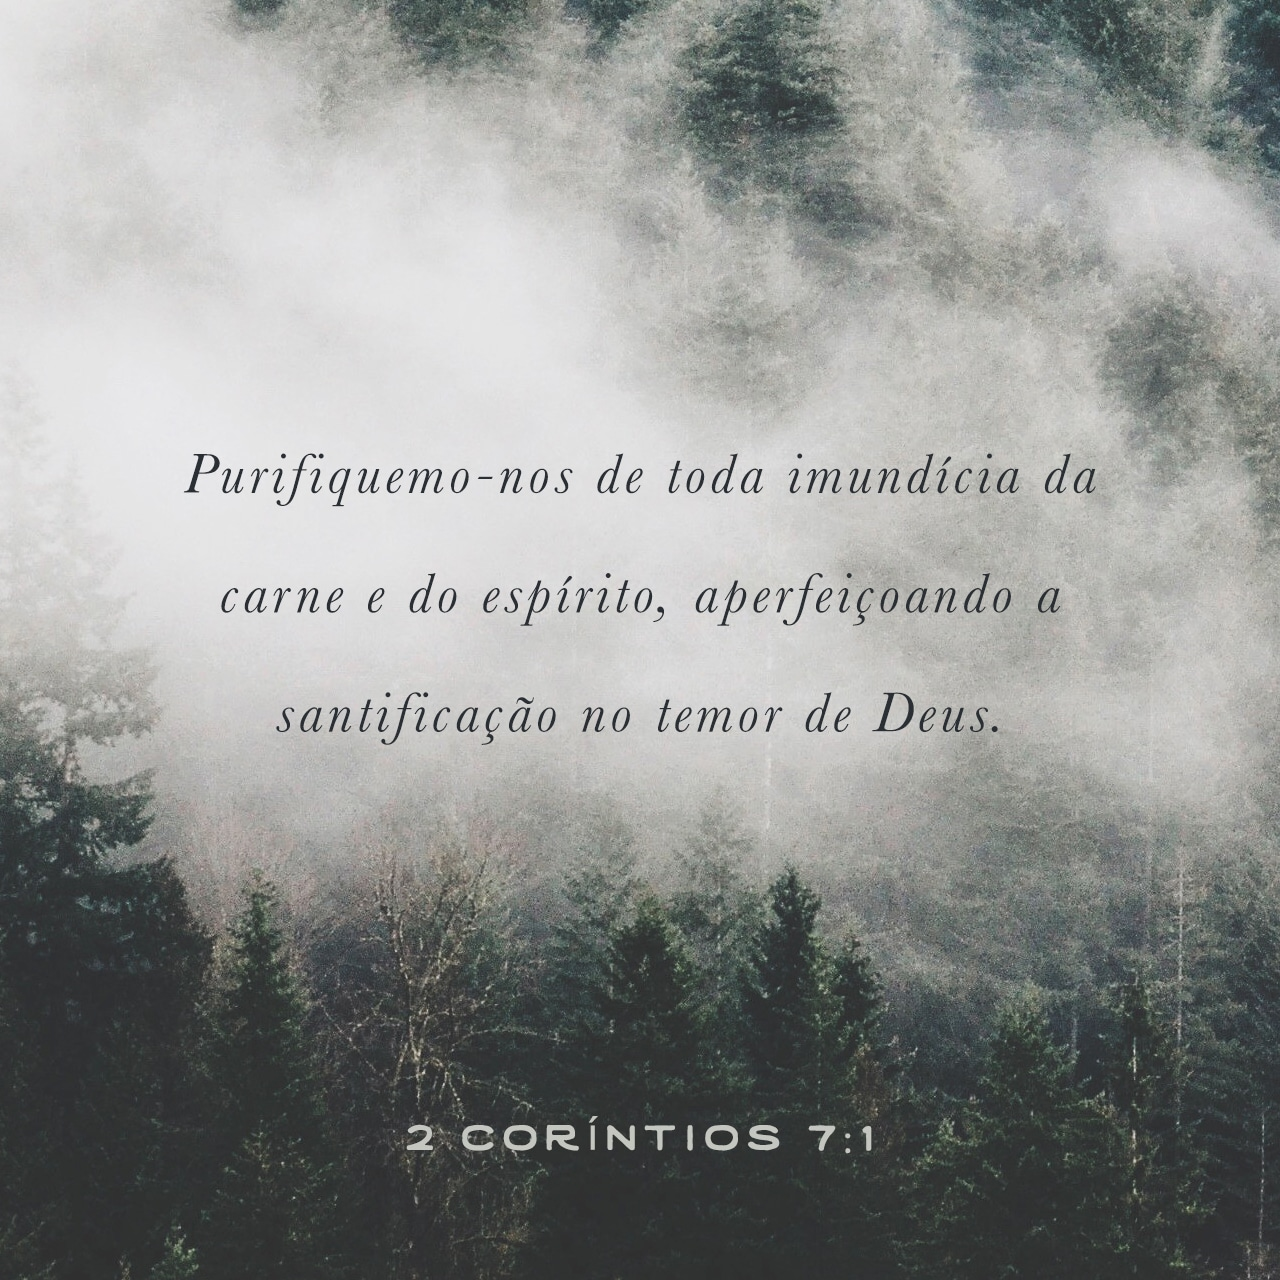 2 Corinthians 7:1 (JPG)